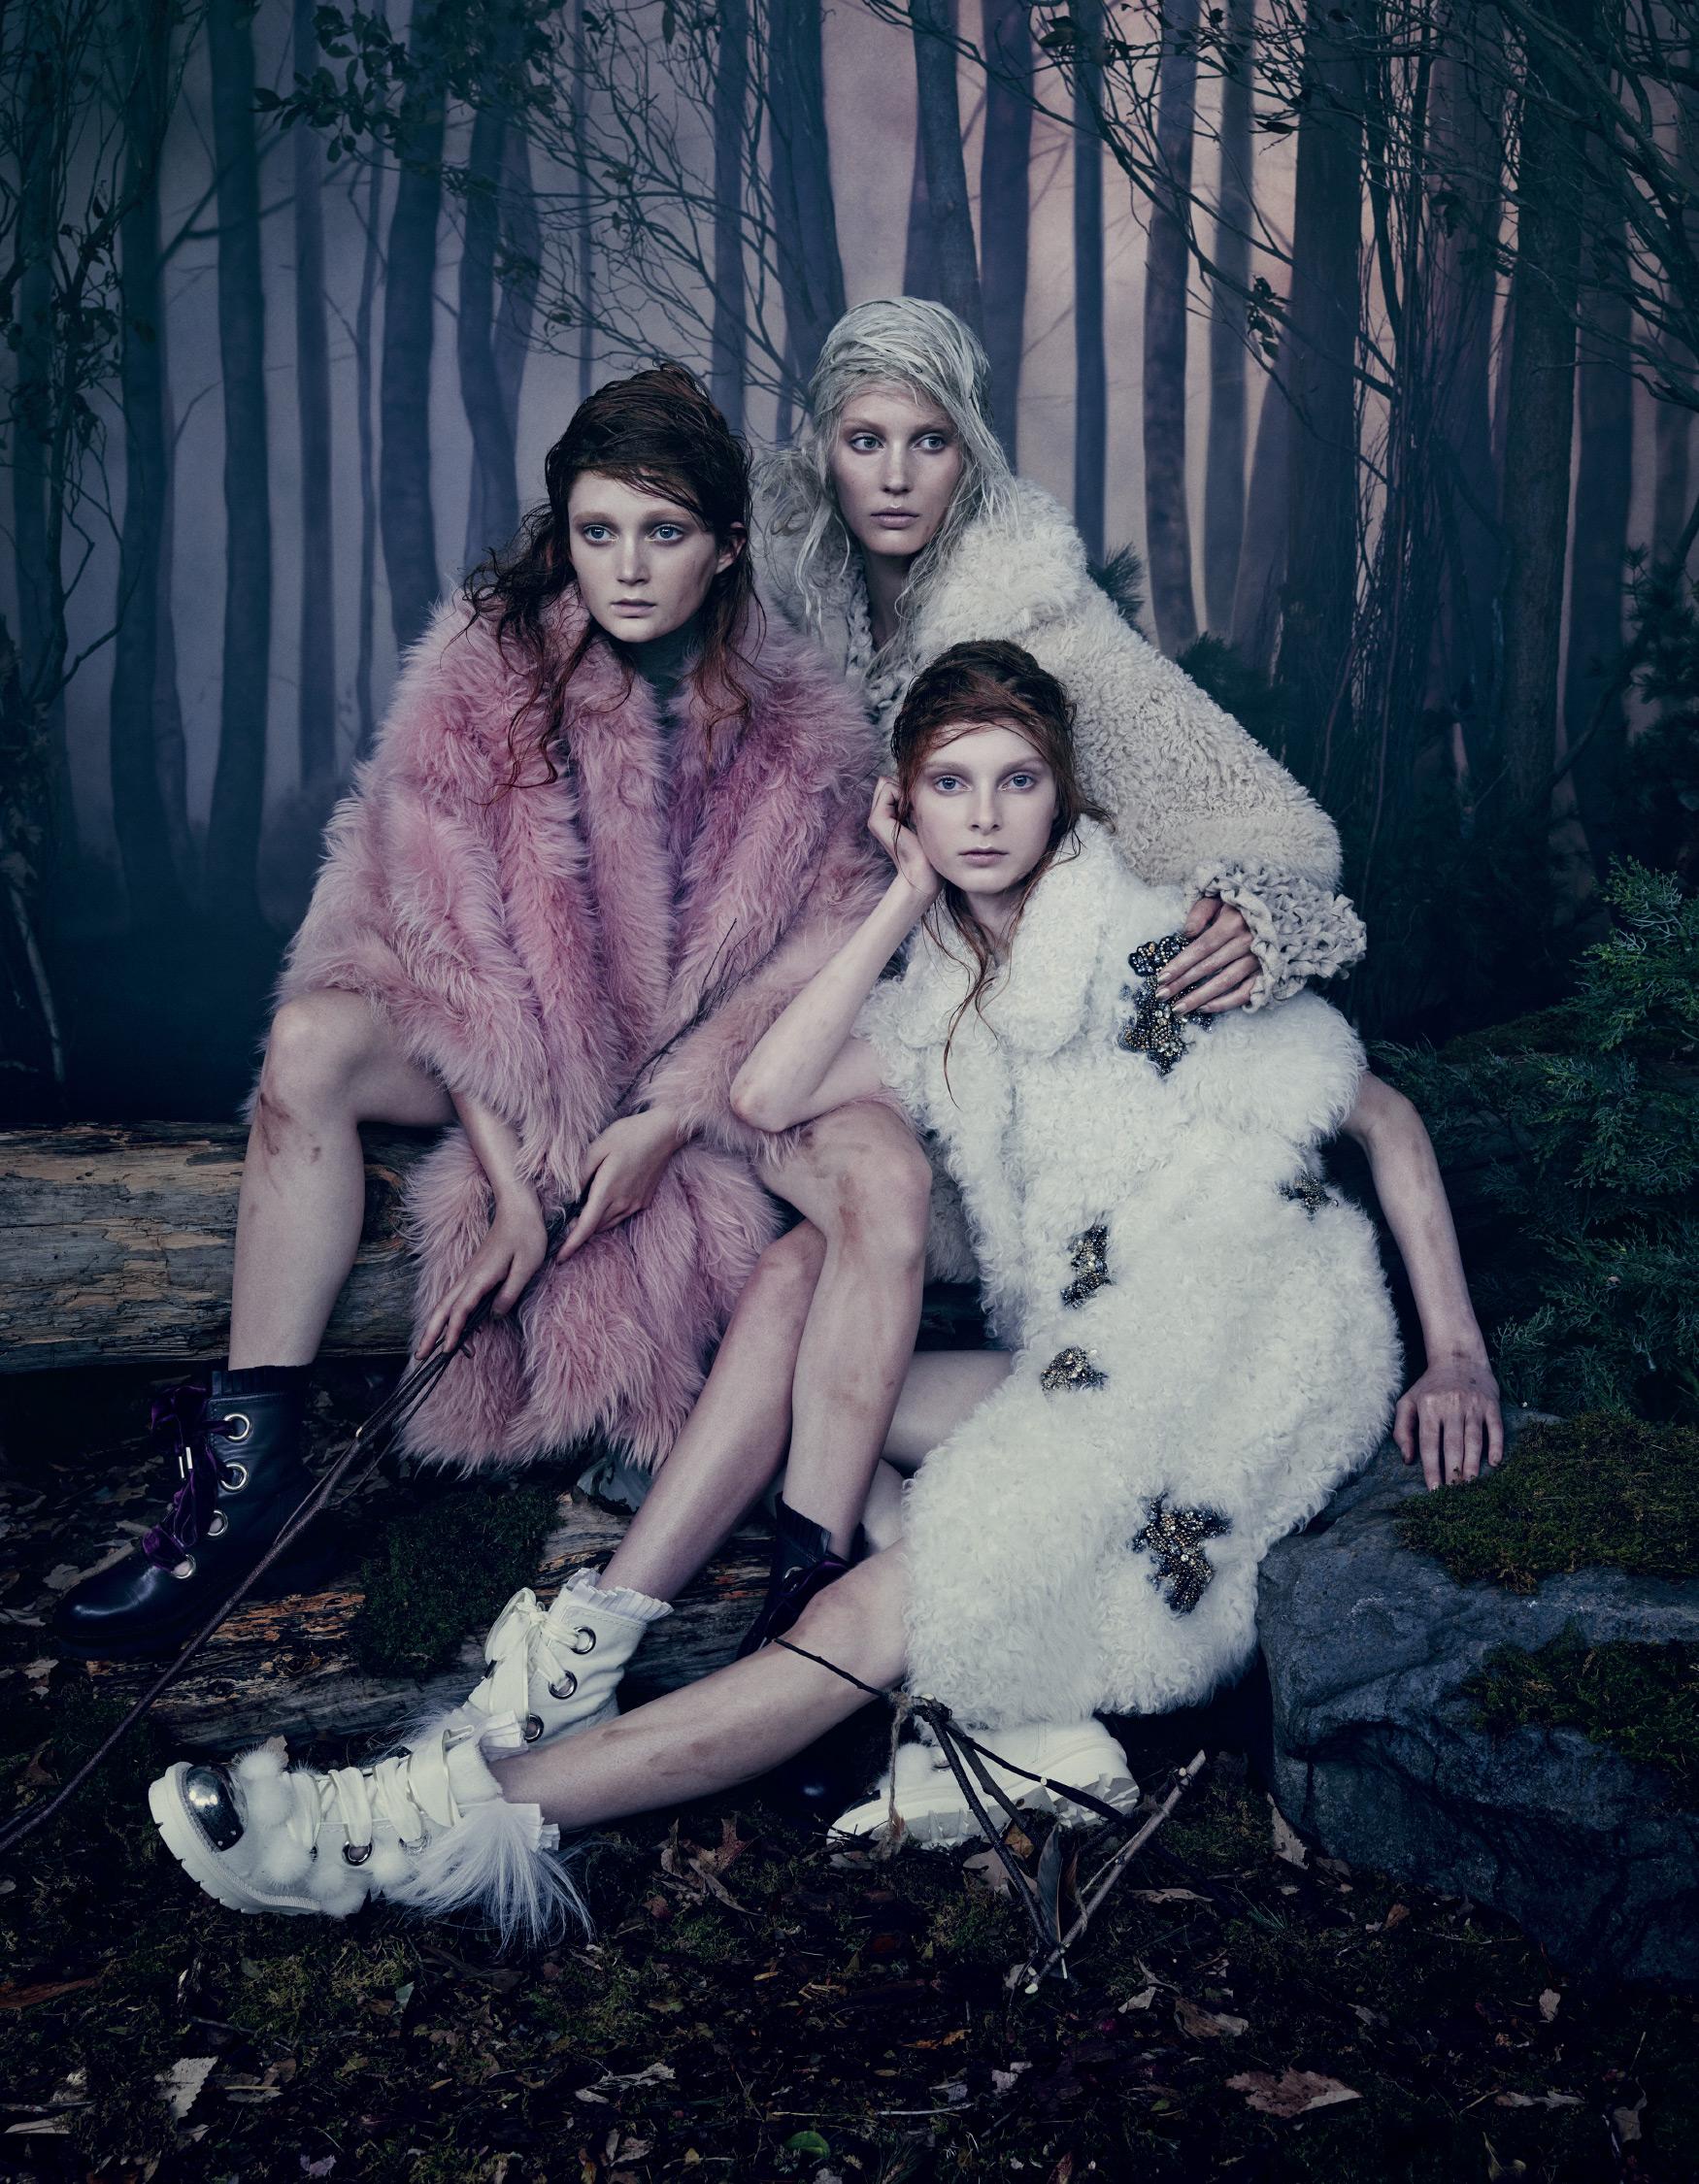 Giovanna-Battaglia-Into-The-Woods-Vogue-Japan-Emma-Summerton-02.jpg